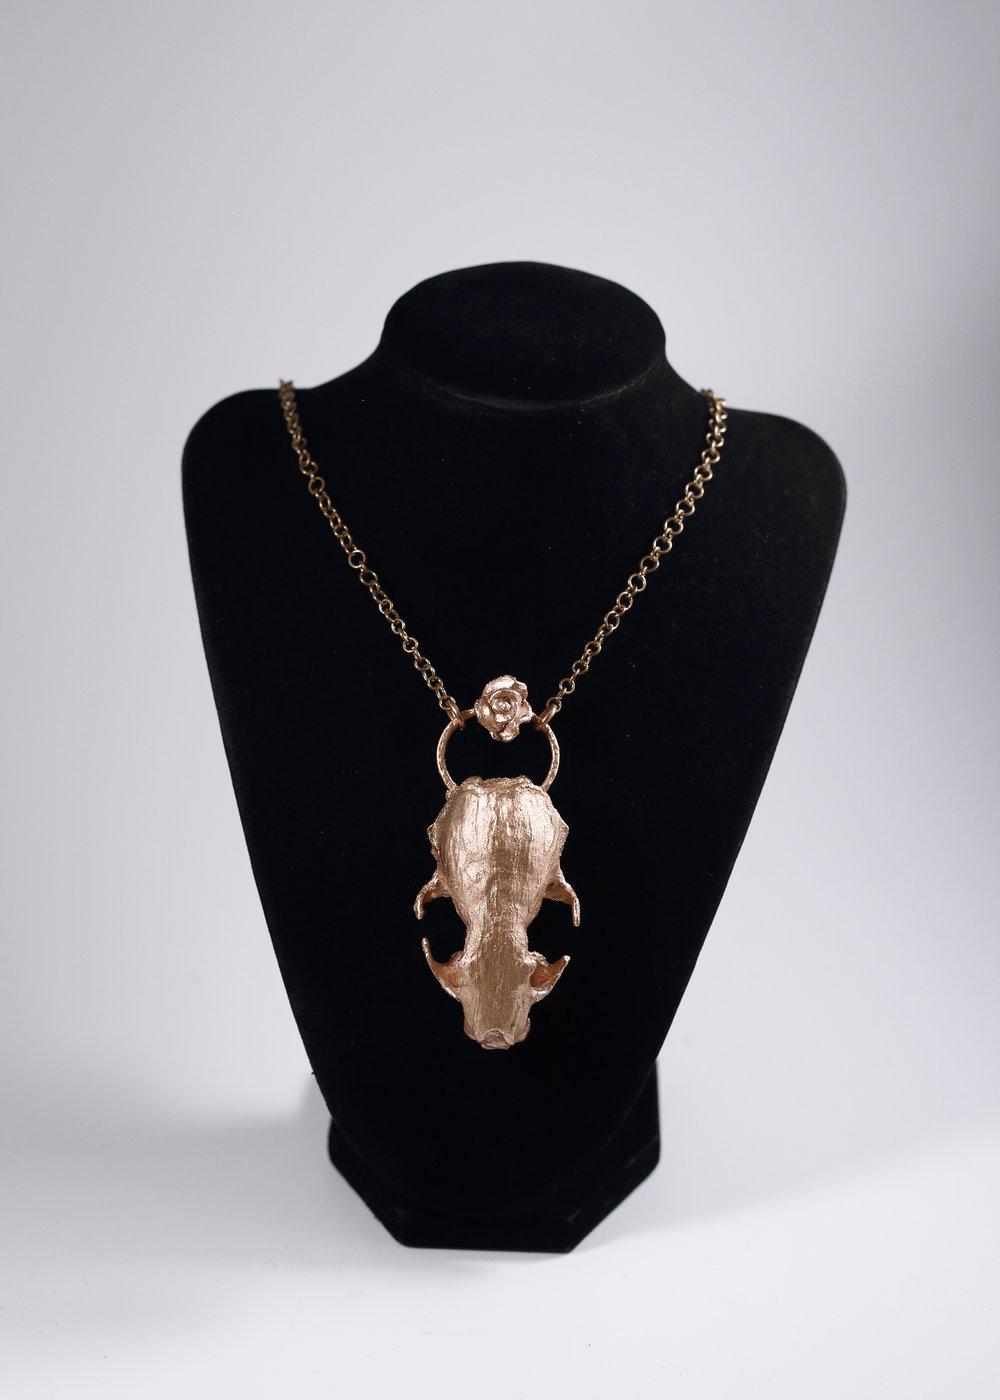 Electroformed_Skull_Necklace.jpg